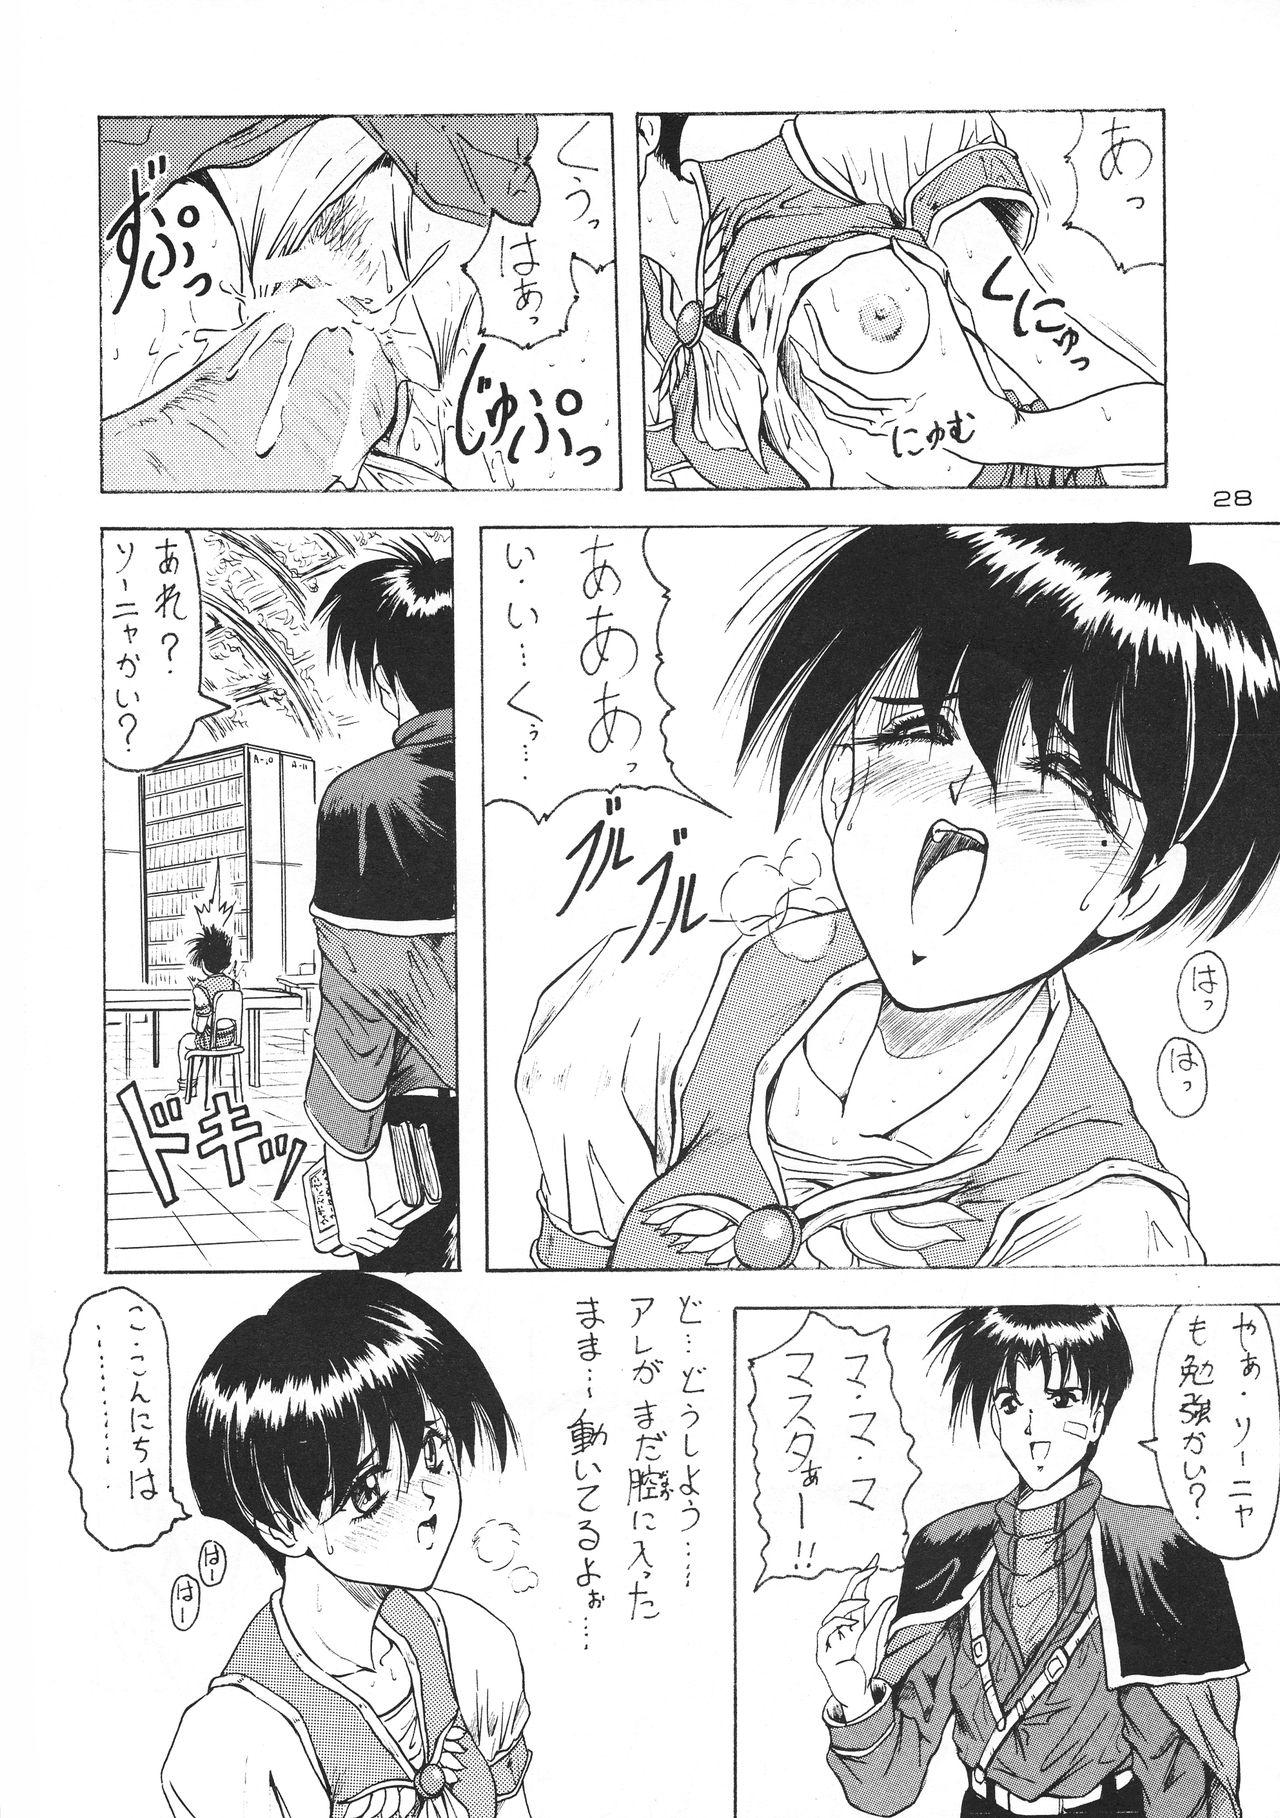 (C51) [J's Style (Jamming)] D2 (DOUBT TO DOUBT) Jamming Kojinshi 4 -Ditsuu- (Various) 27